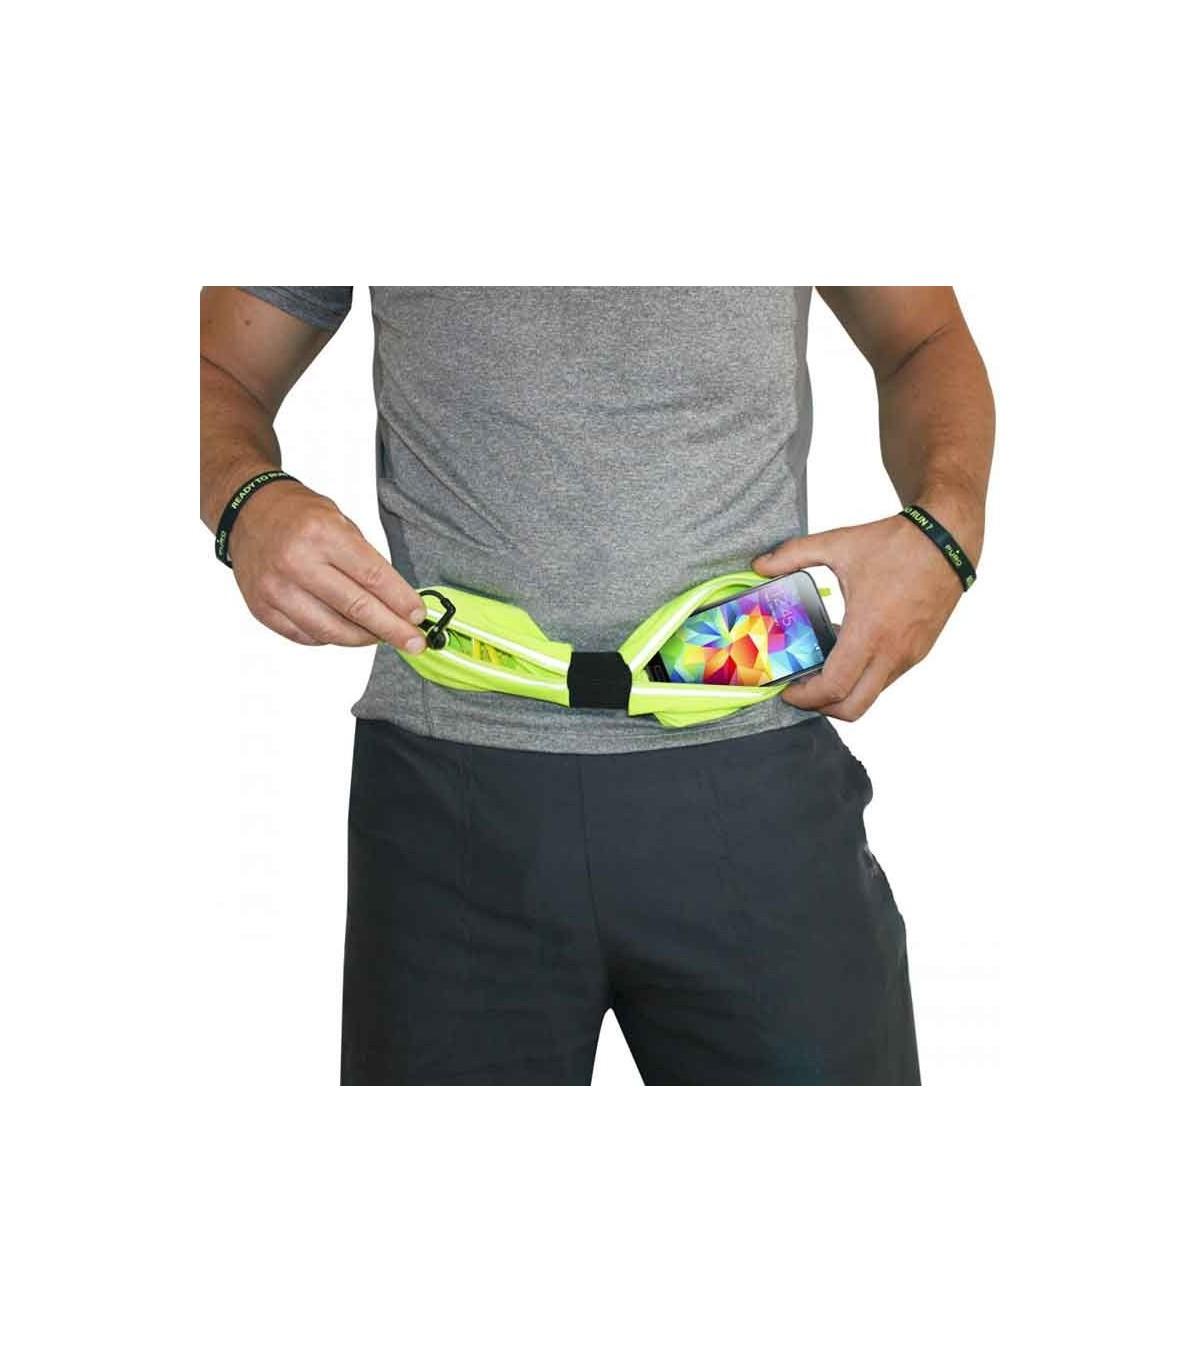 کمر بند ورزشیPuro Universal Double Strech Pouch Sport Belt Smartphones Up to 6.3